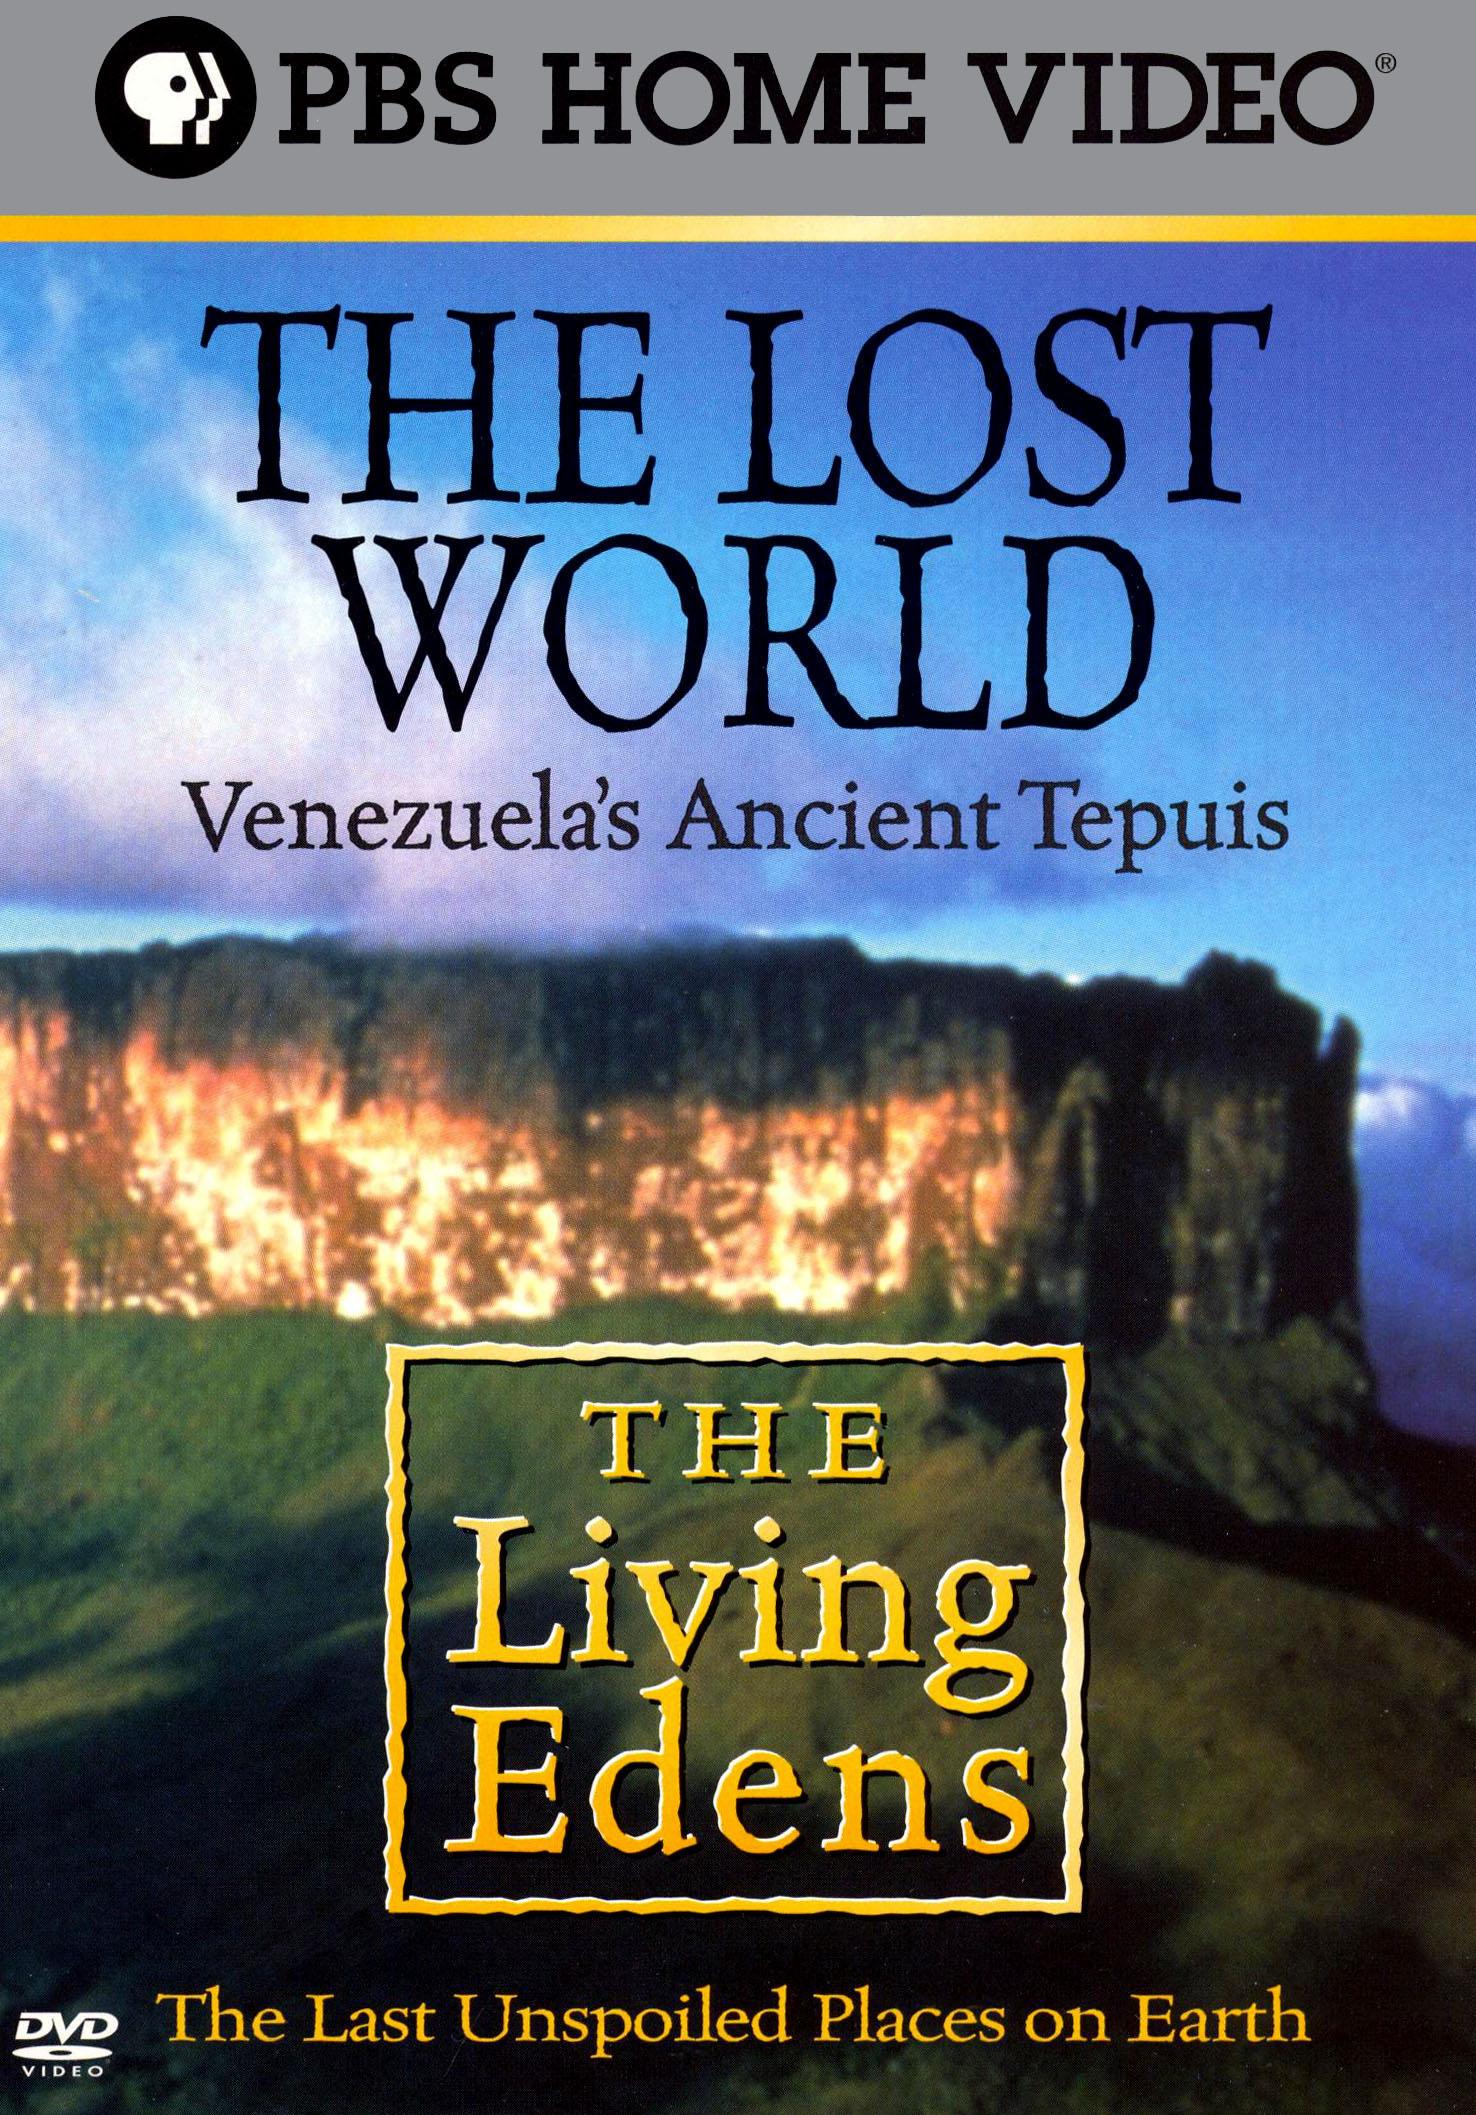 The Living Edens: The Lost World - Venezuela's Ancient Tepuis